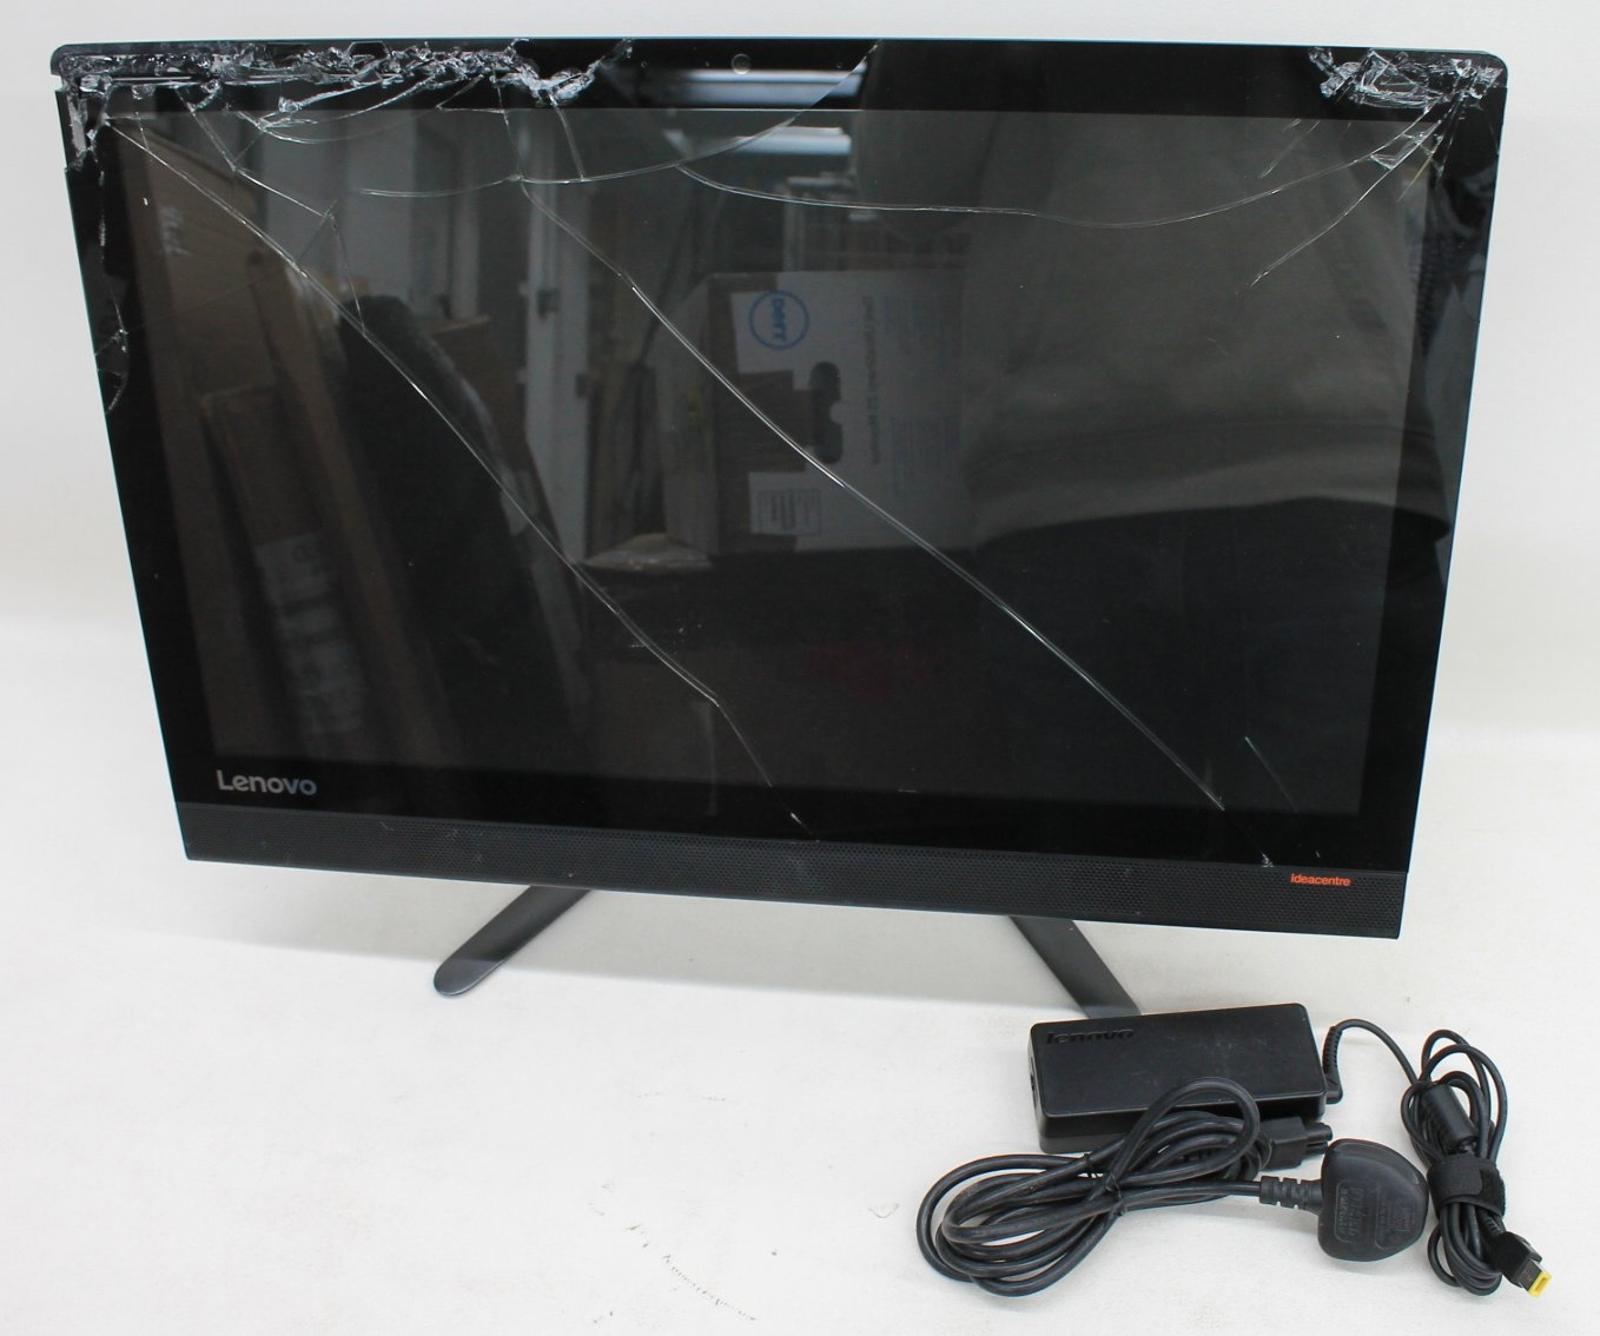 LENOVO-300-23ACL-23-034-AMD-A8-2-2GHz-8GB-1TB-Windows-10-all-in-One-computer-difettoso miniatura 12